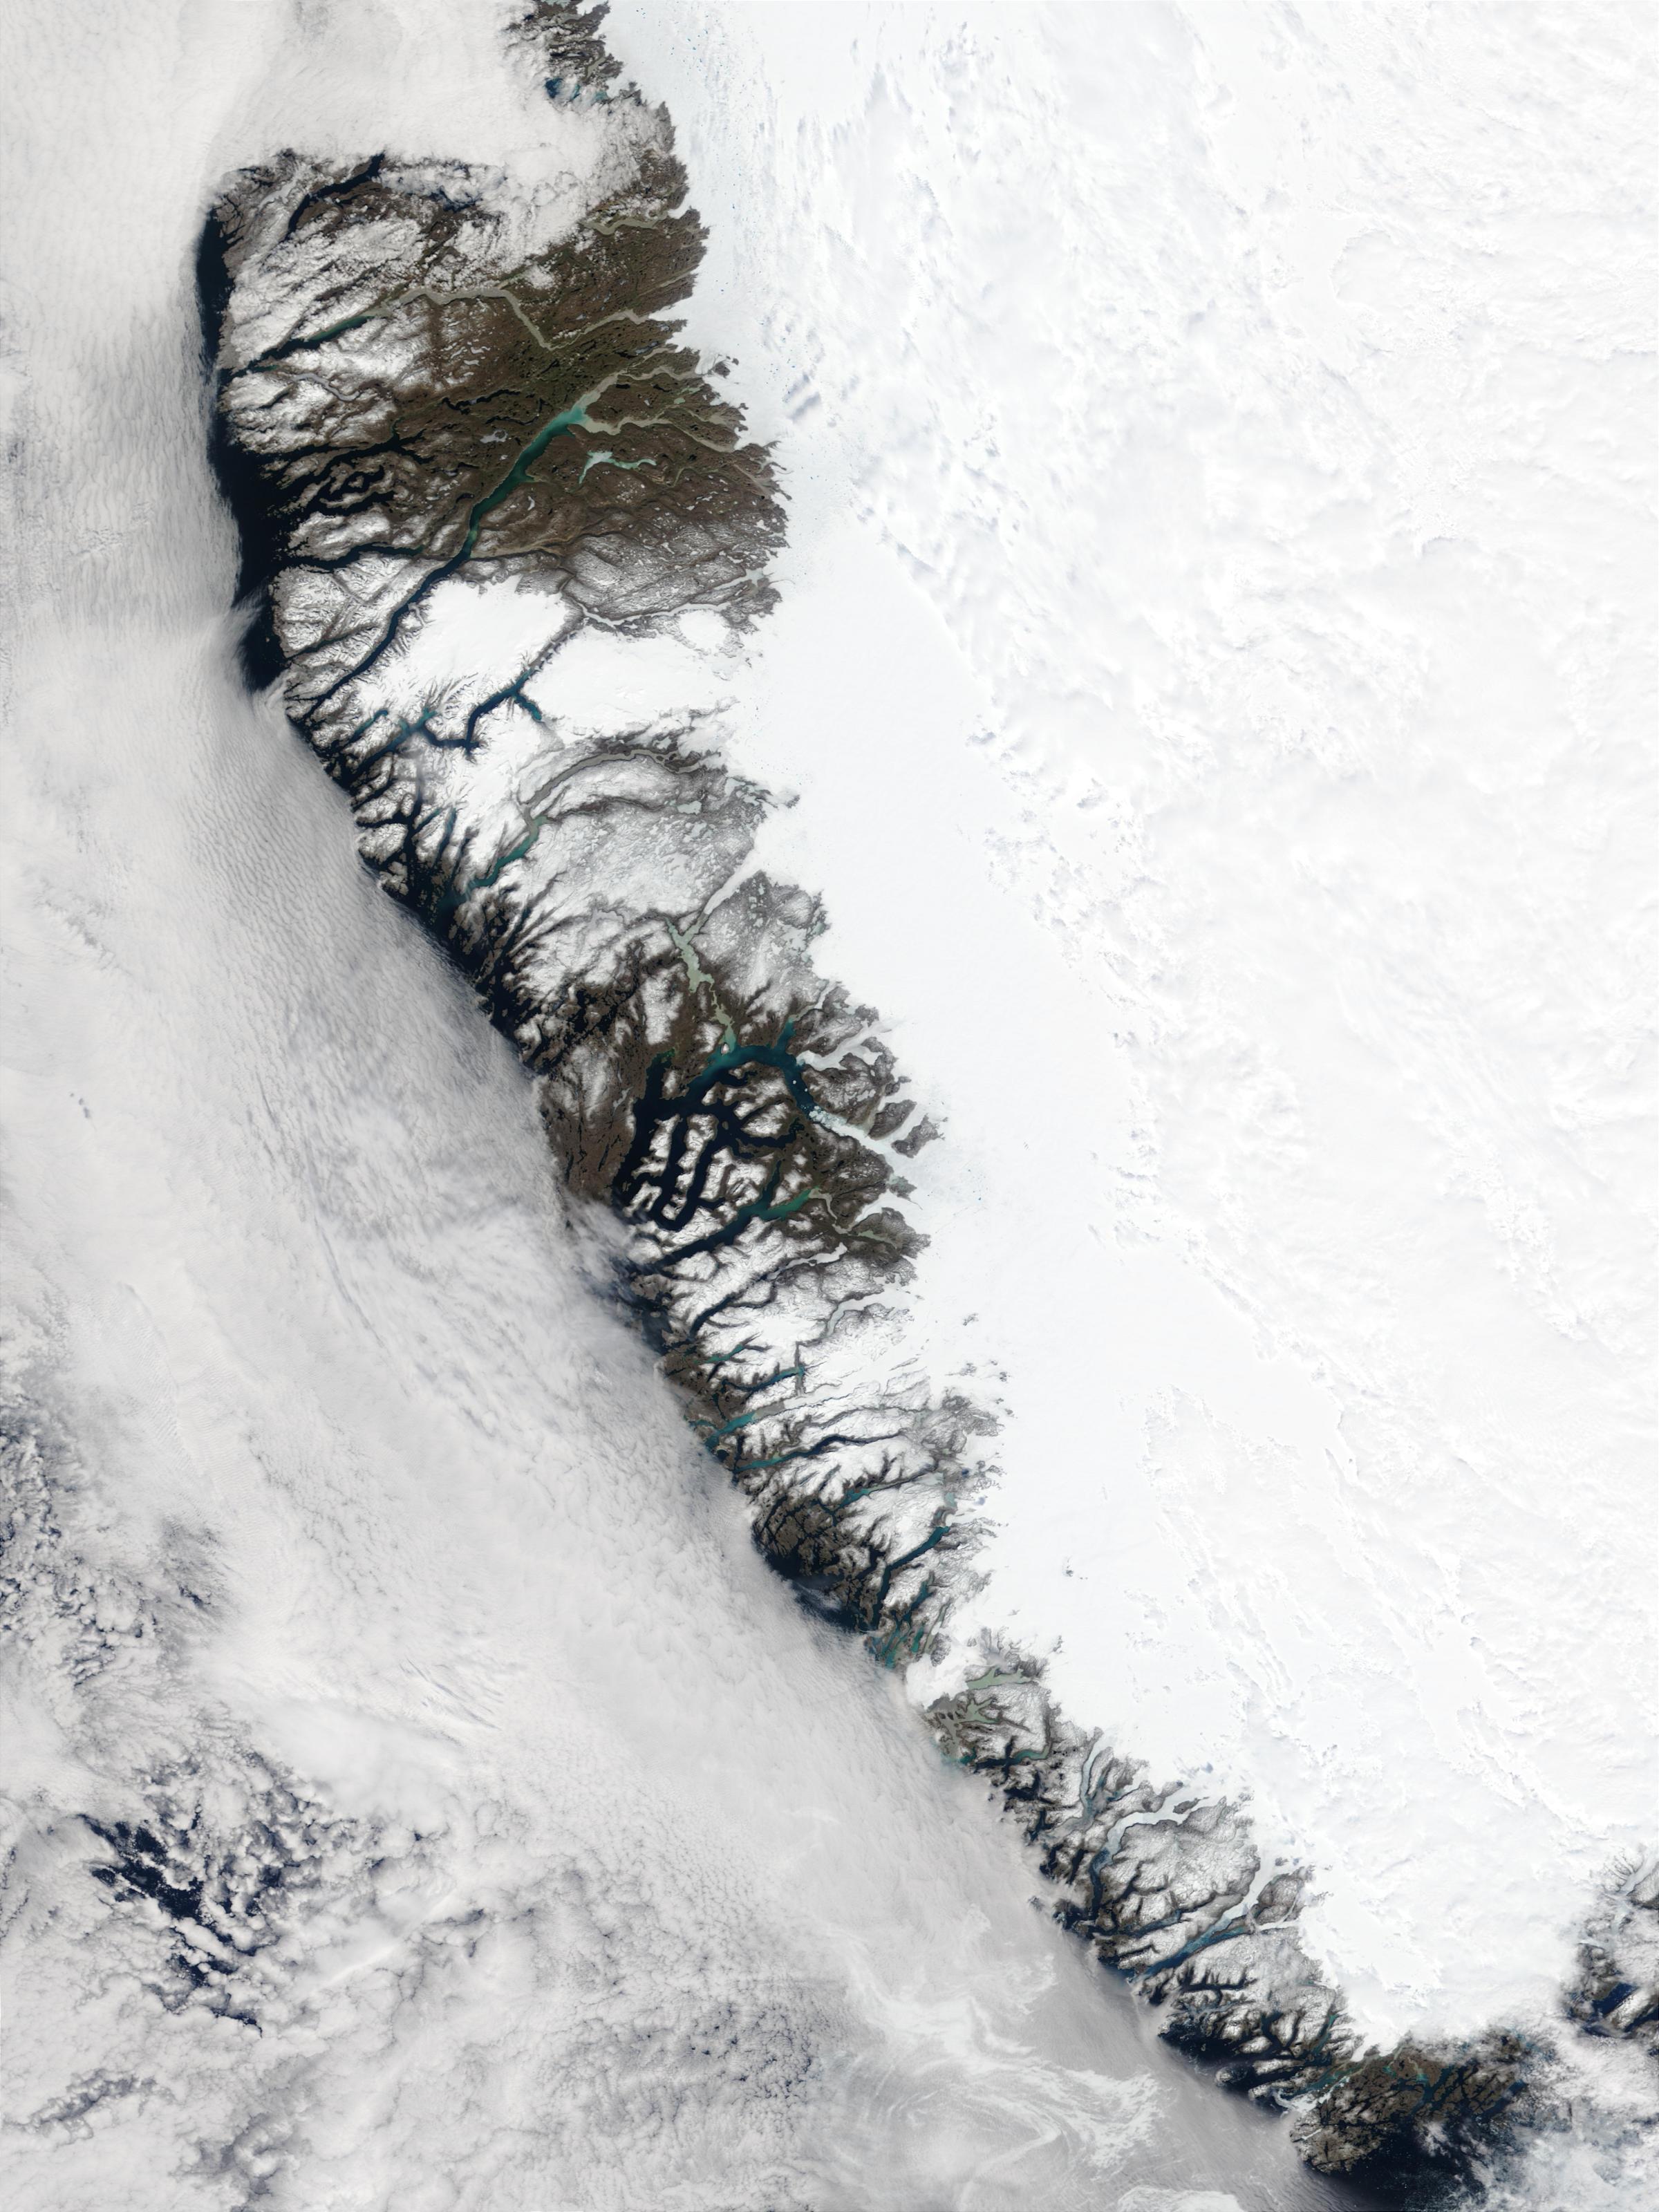 Groenlandia suroccidental